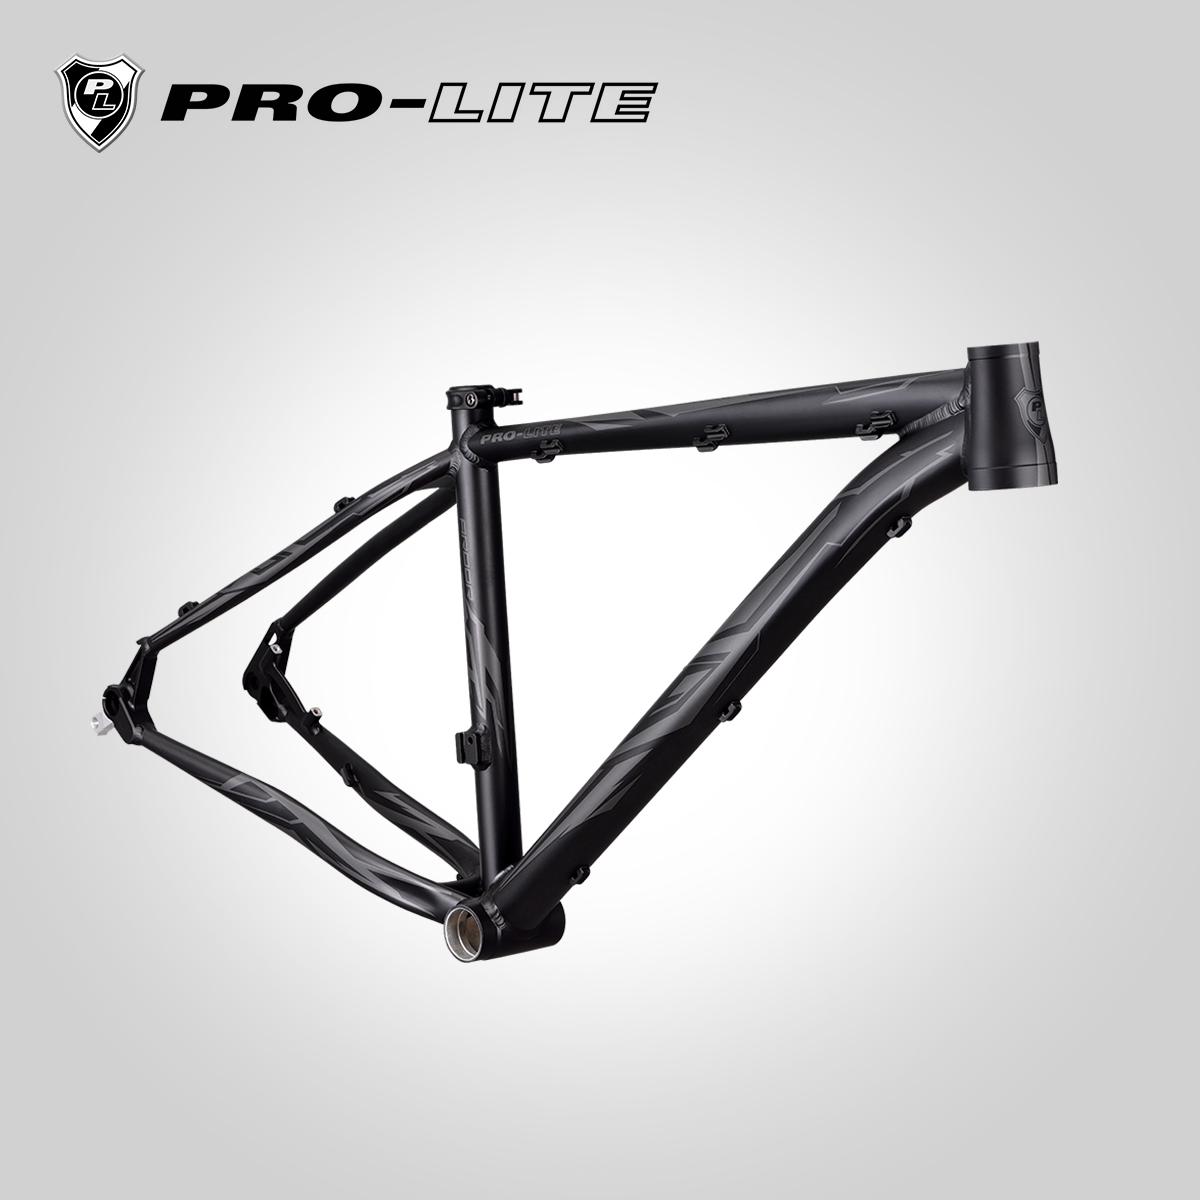 Pro-Lite自行车车架铝合金自行车架组装15寸17寸山地车车架26寸